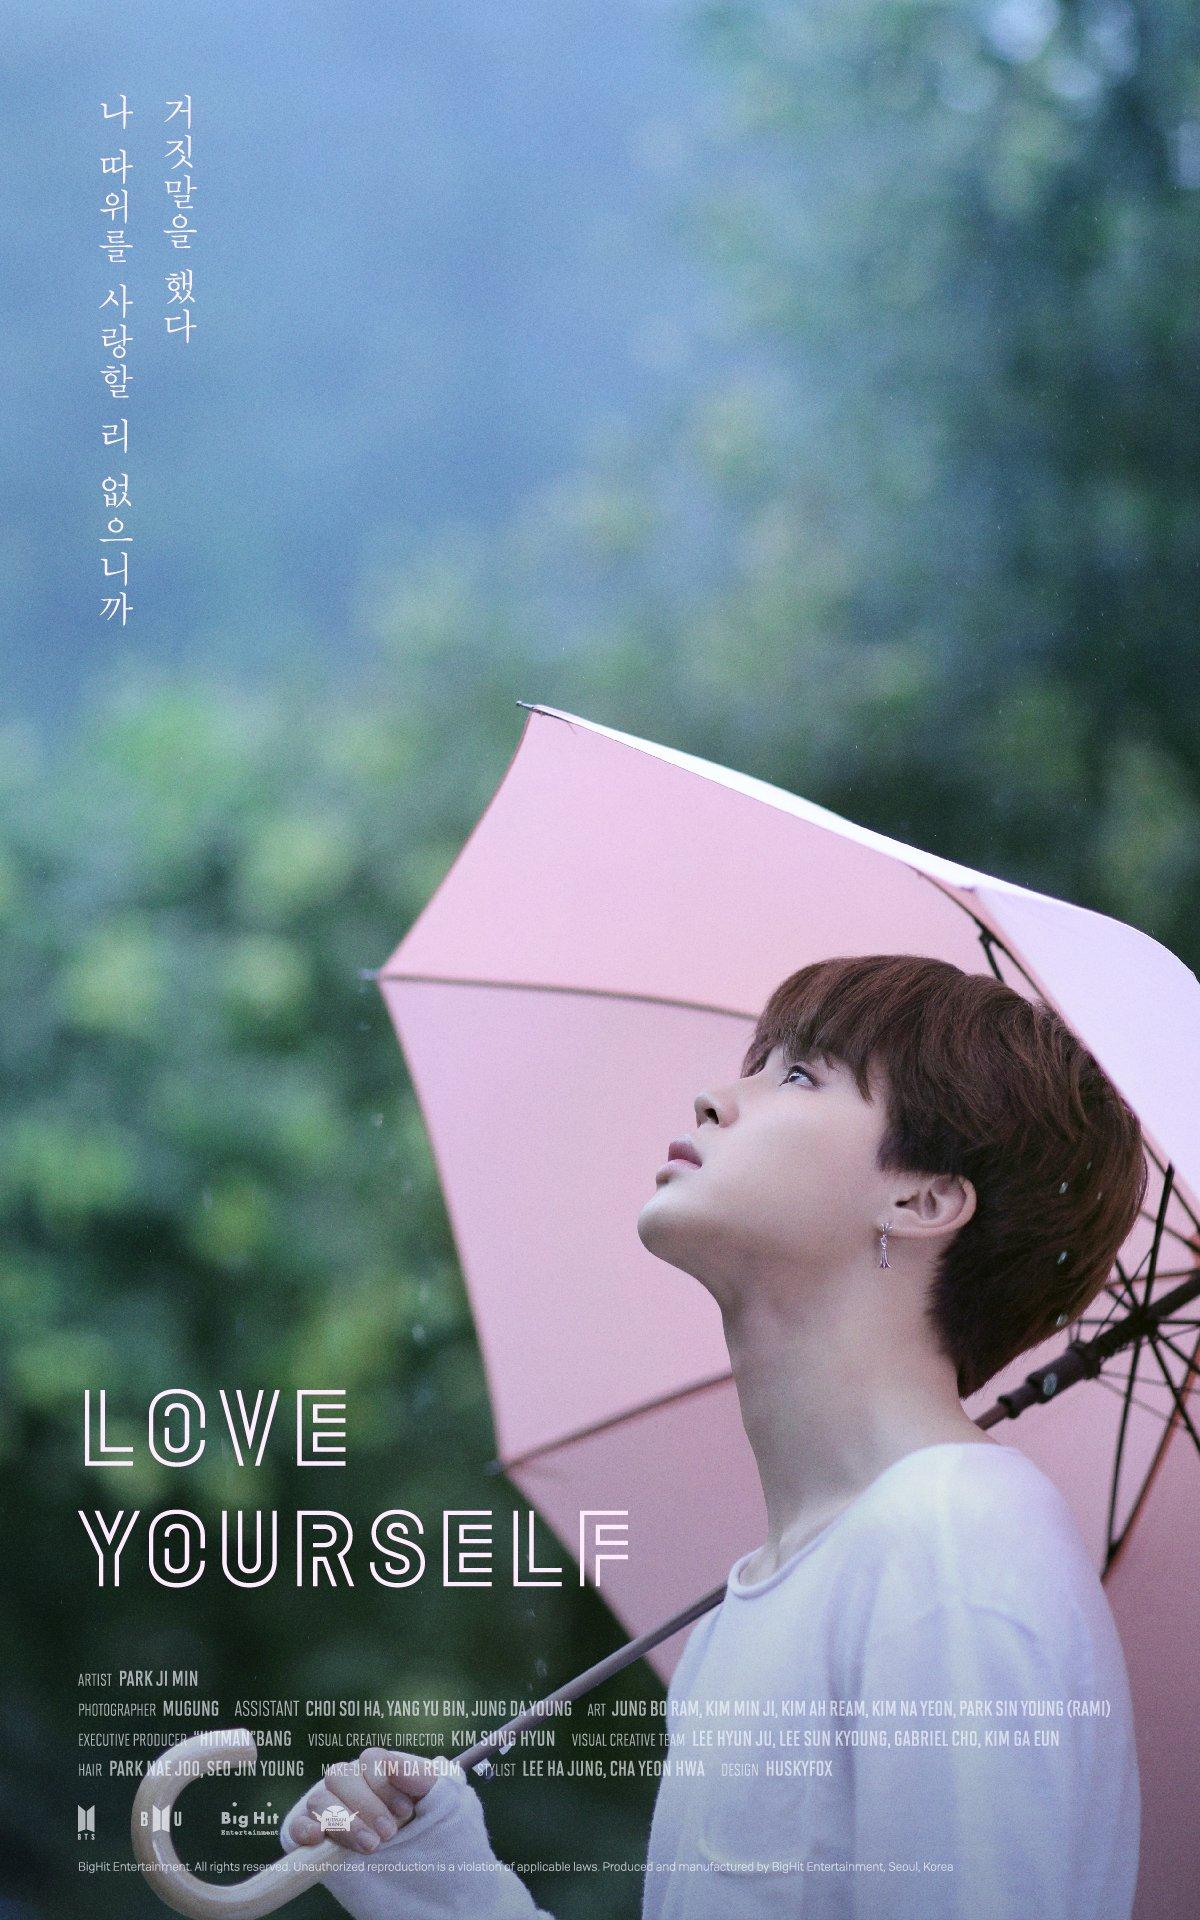 #BTS #방탄소년단 #LOVE_YOURSELF Poster #JIMIN https://t.co/72Q2Qo0USK